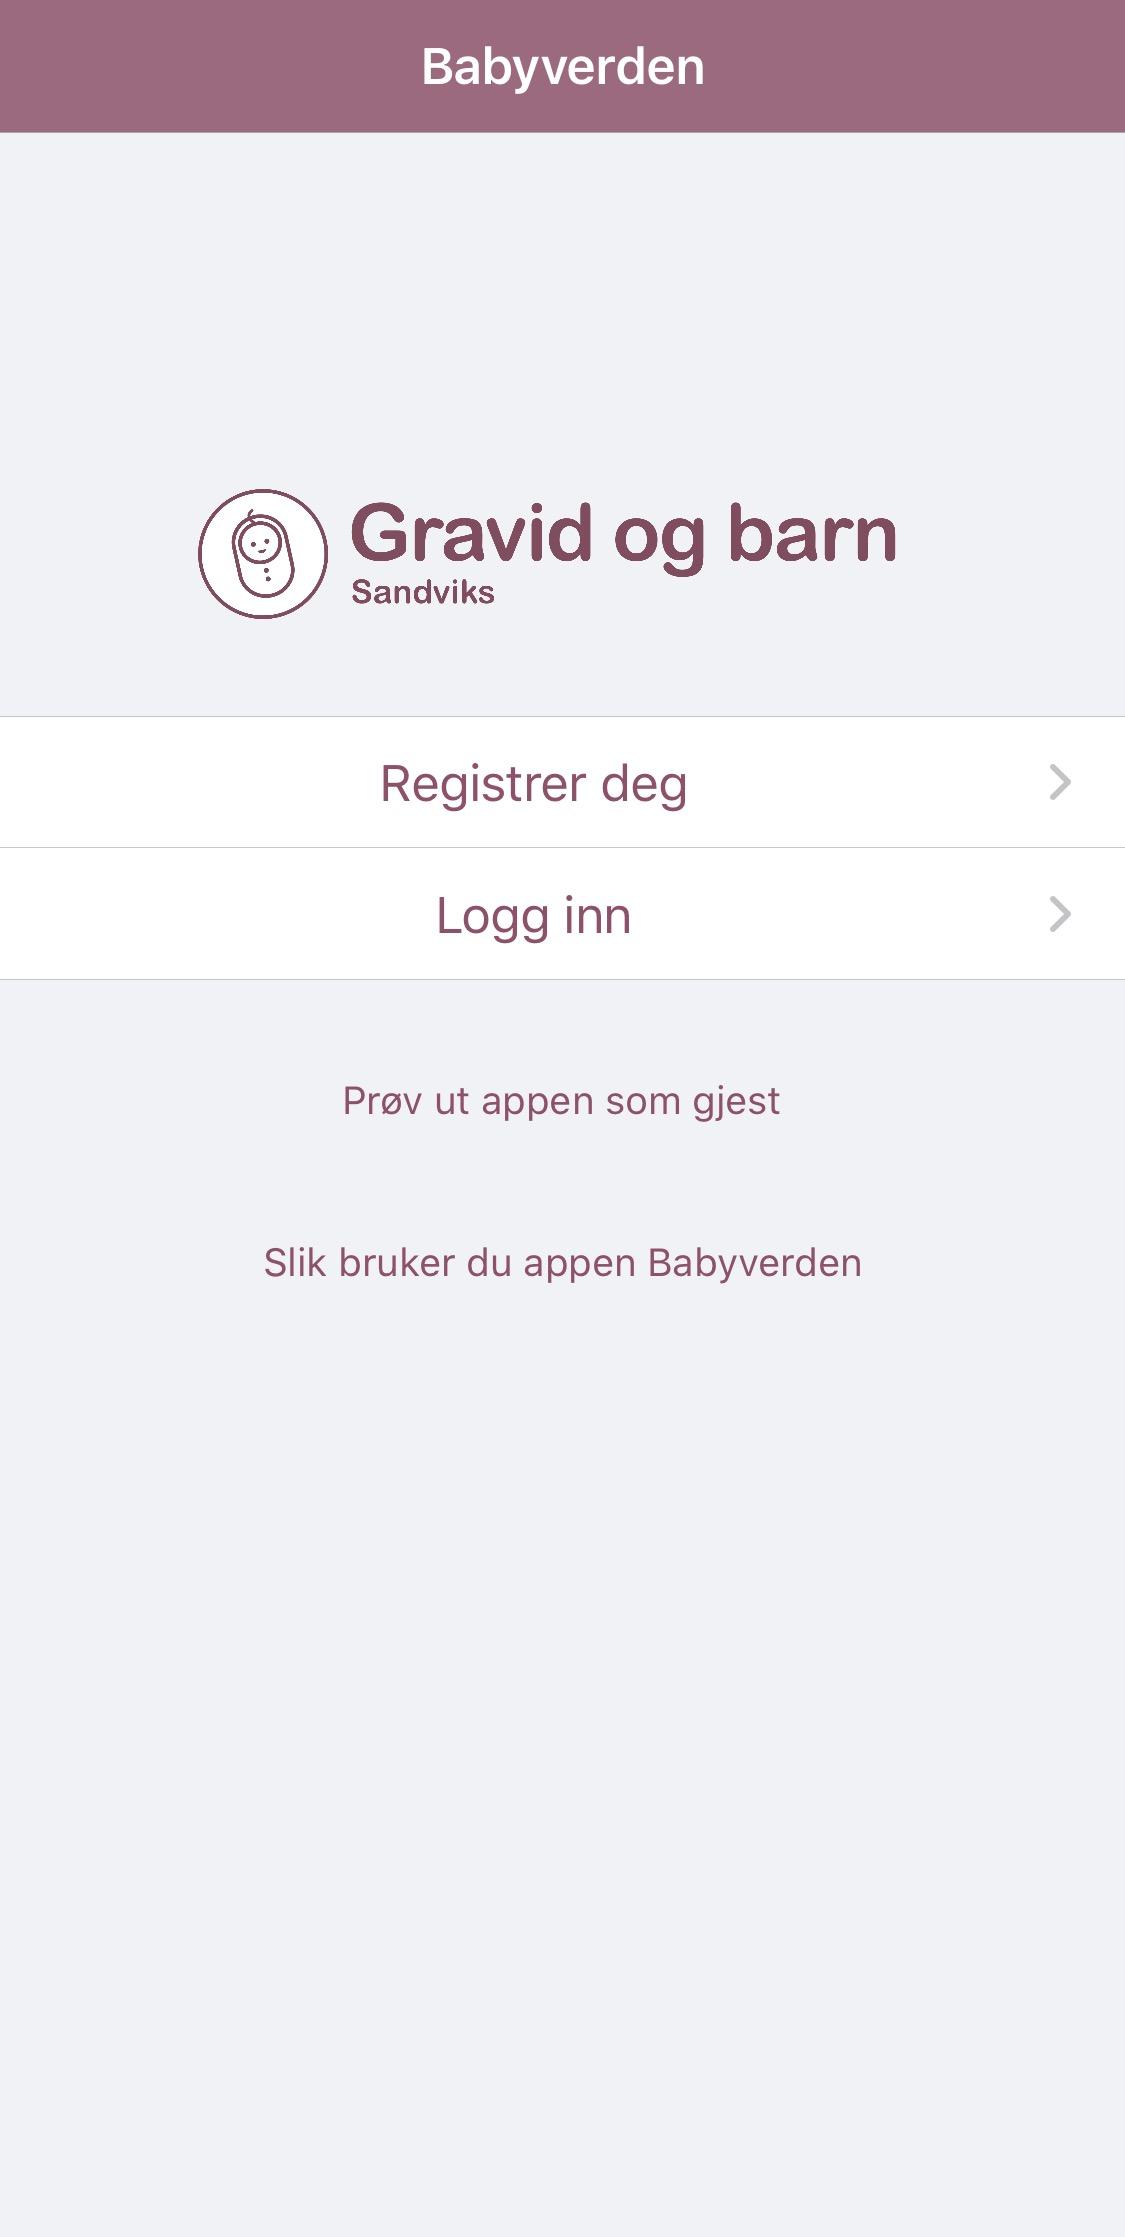 Babyverden-appen